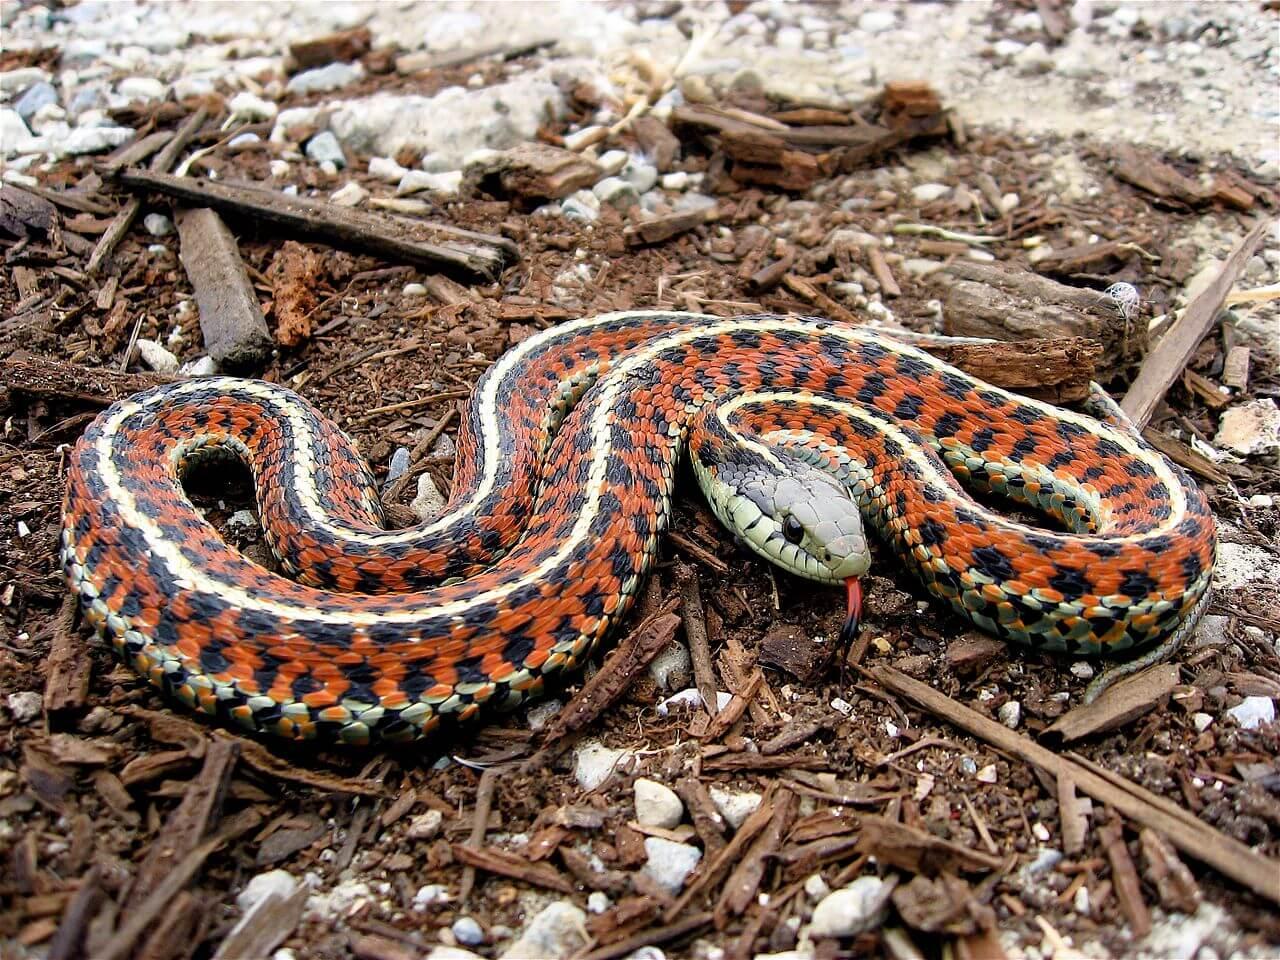 Snake Veterinarian